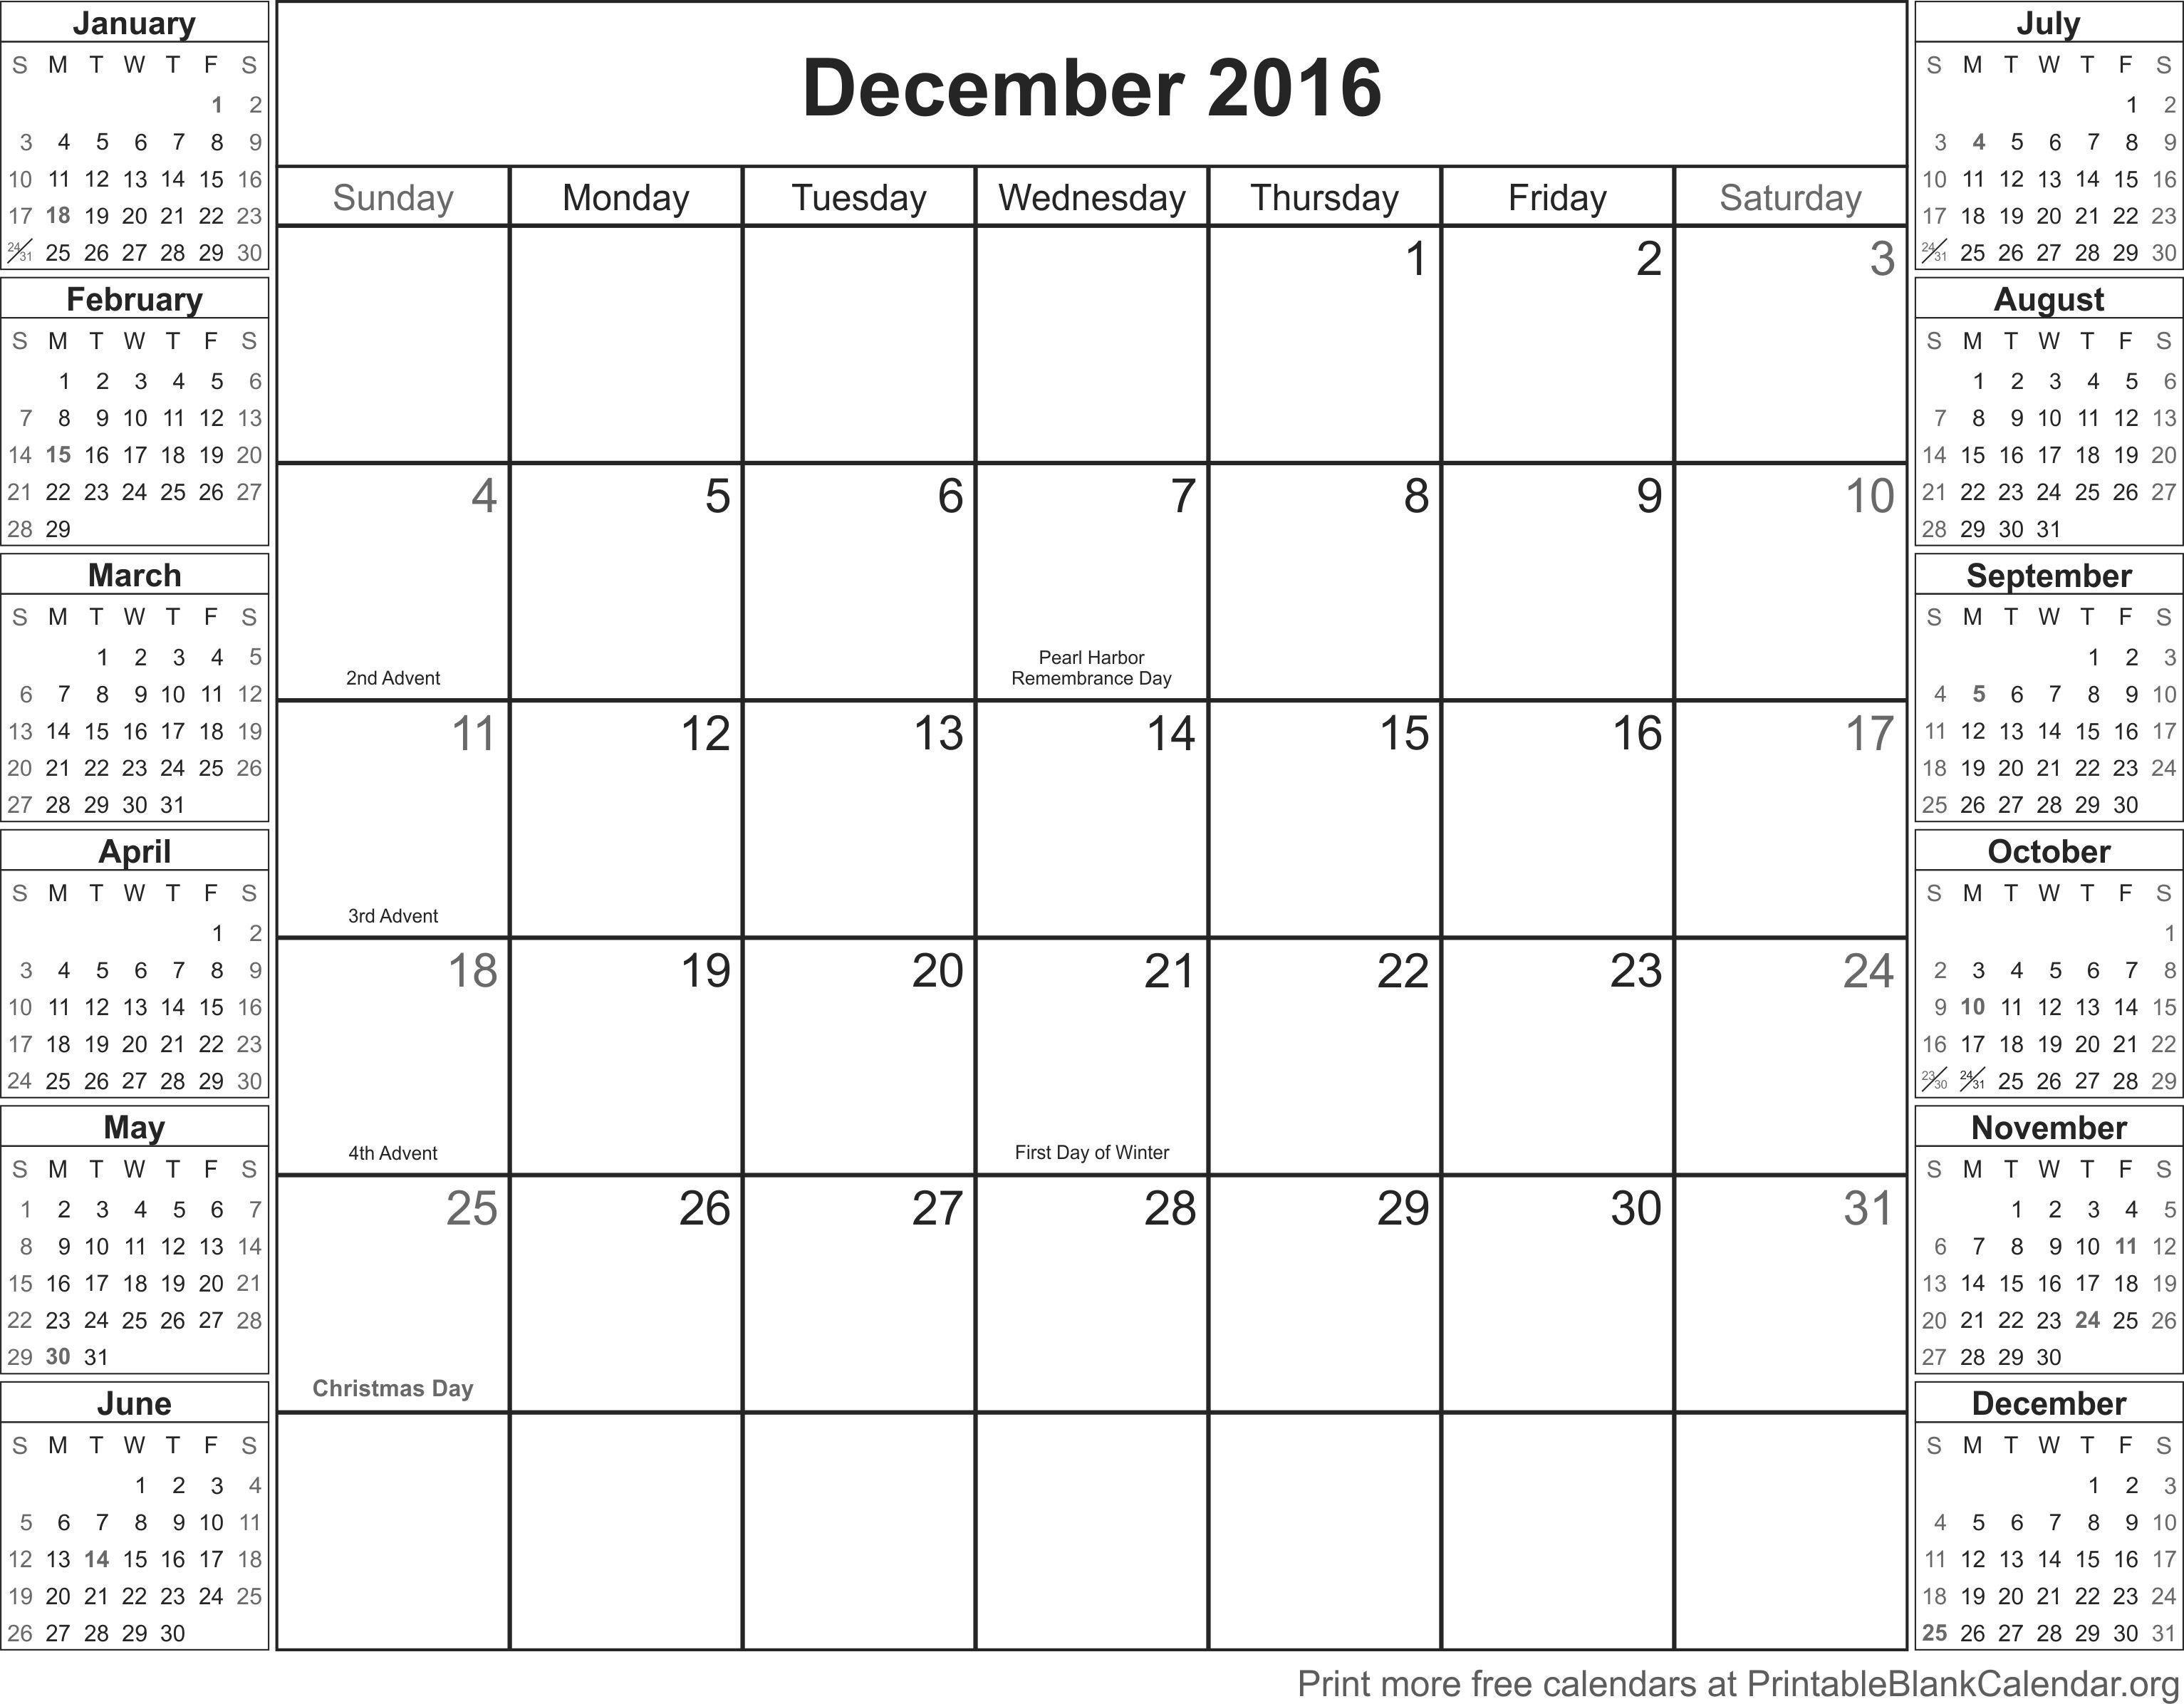 December 2016 free printable calendar - Printable Blank Calendar.org